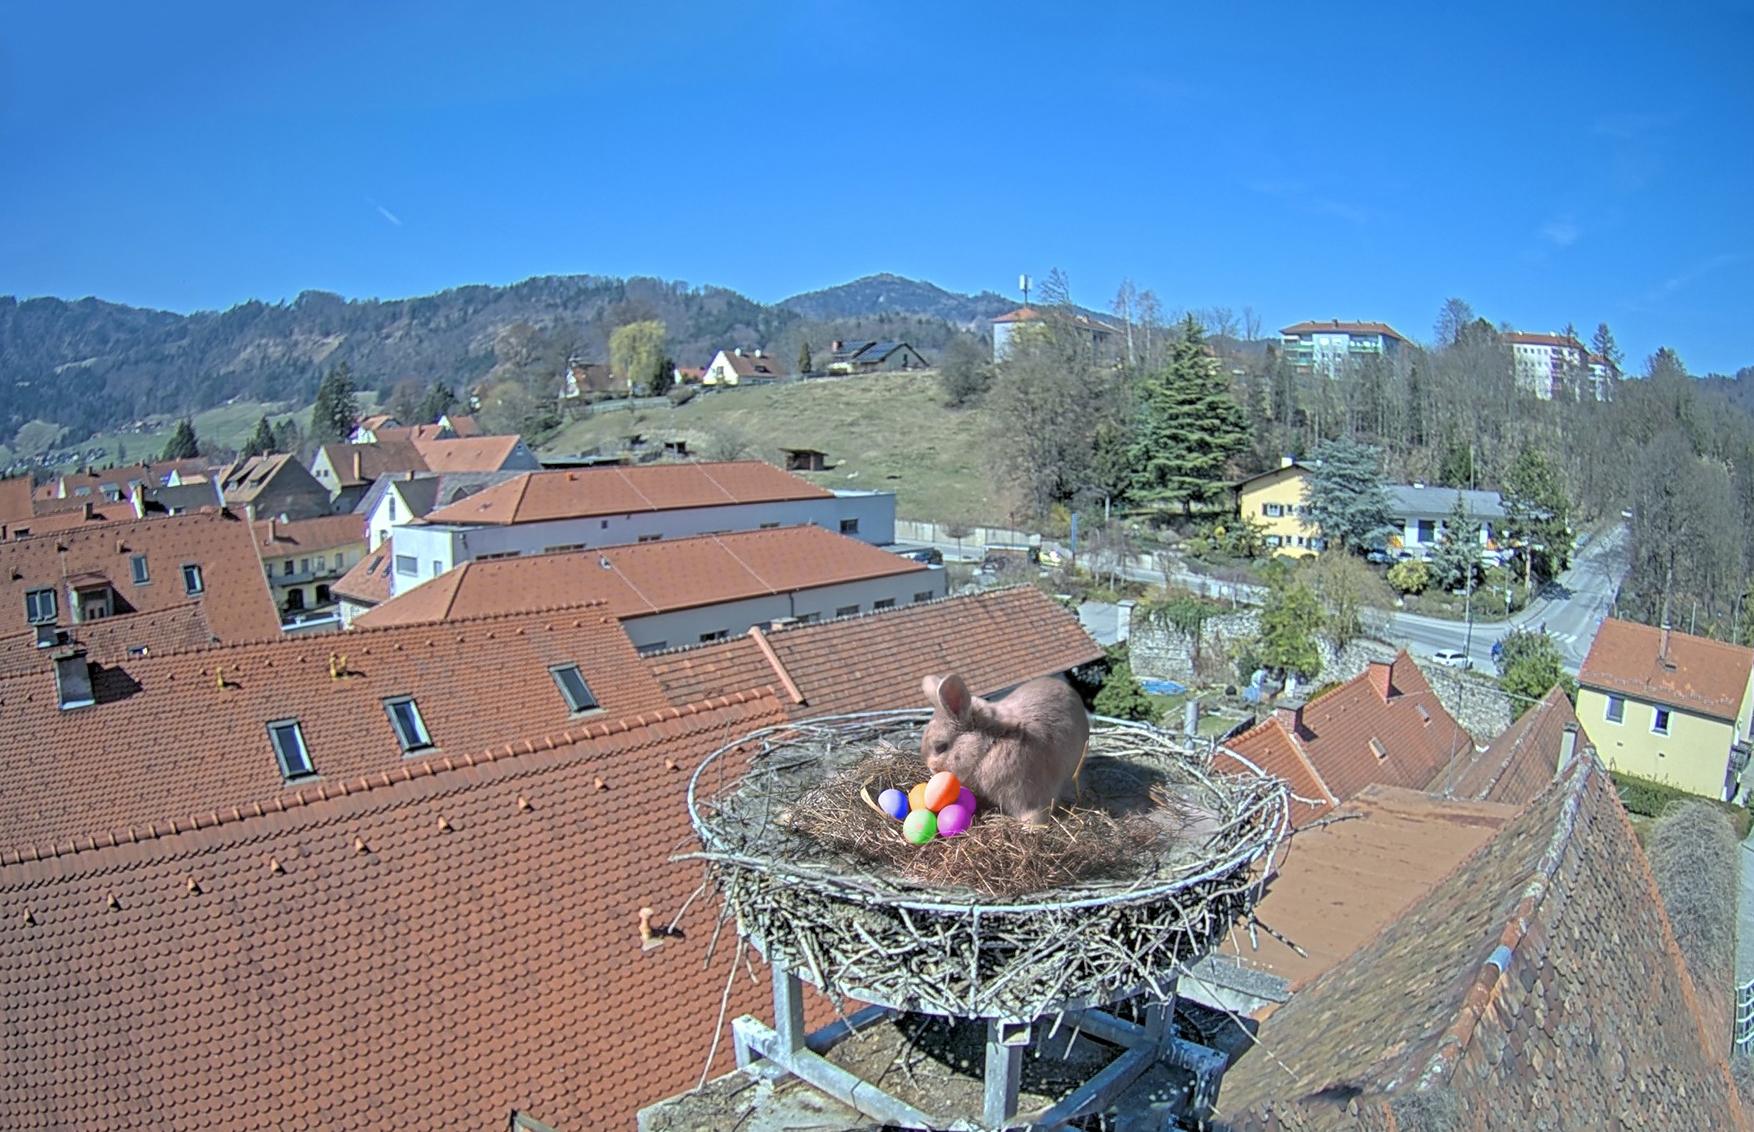 Frohe Ostern 2021 Hase auf dem Dach